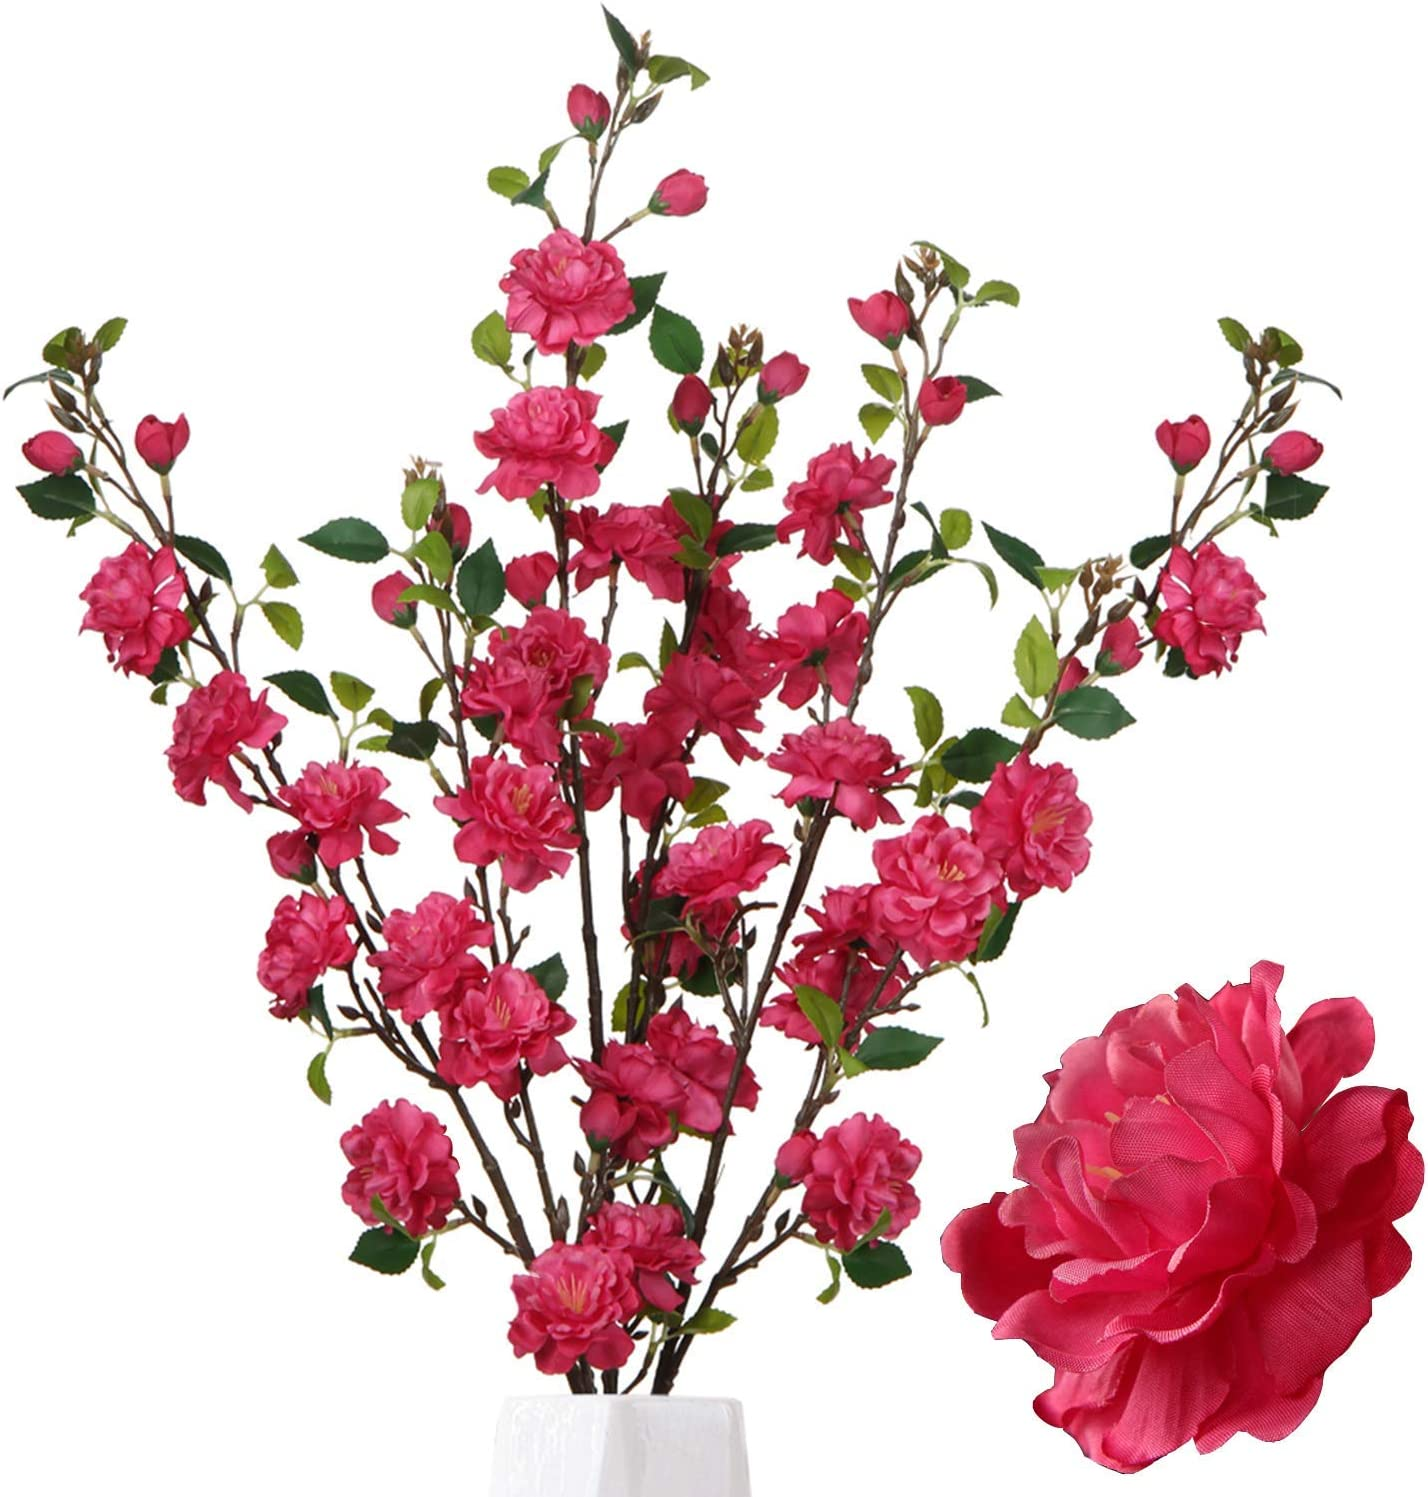 Kesio 3 Pcs Artificial Flowers Silk Peach Blossom Arrangements Fake Plants Flower Branches Apple Blossom Stem 35